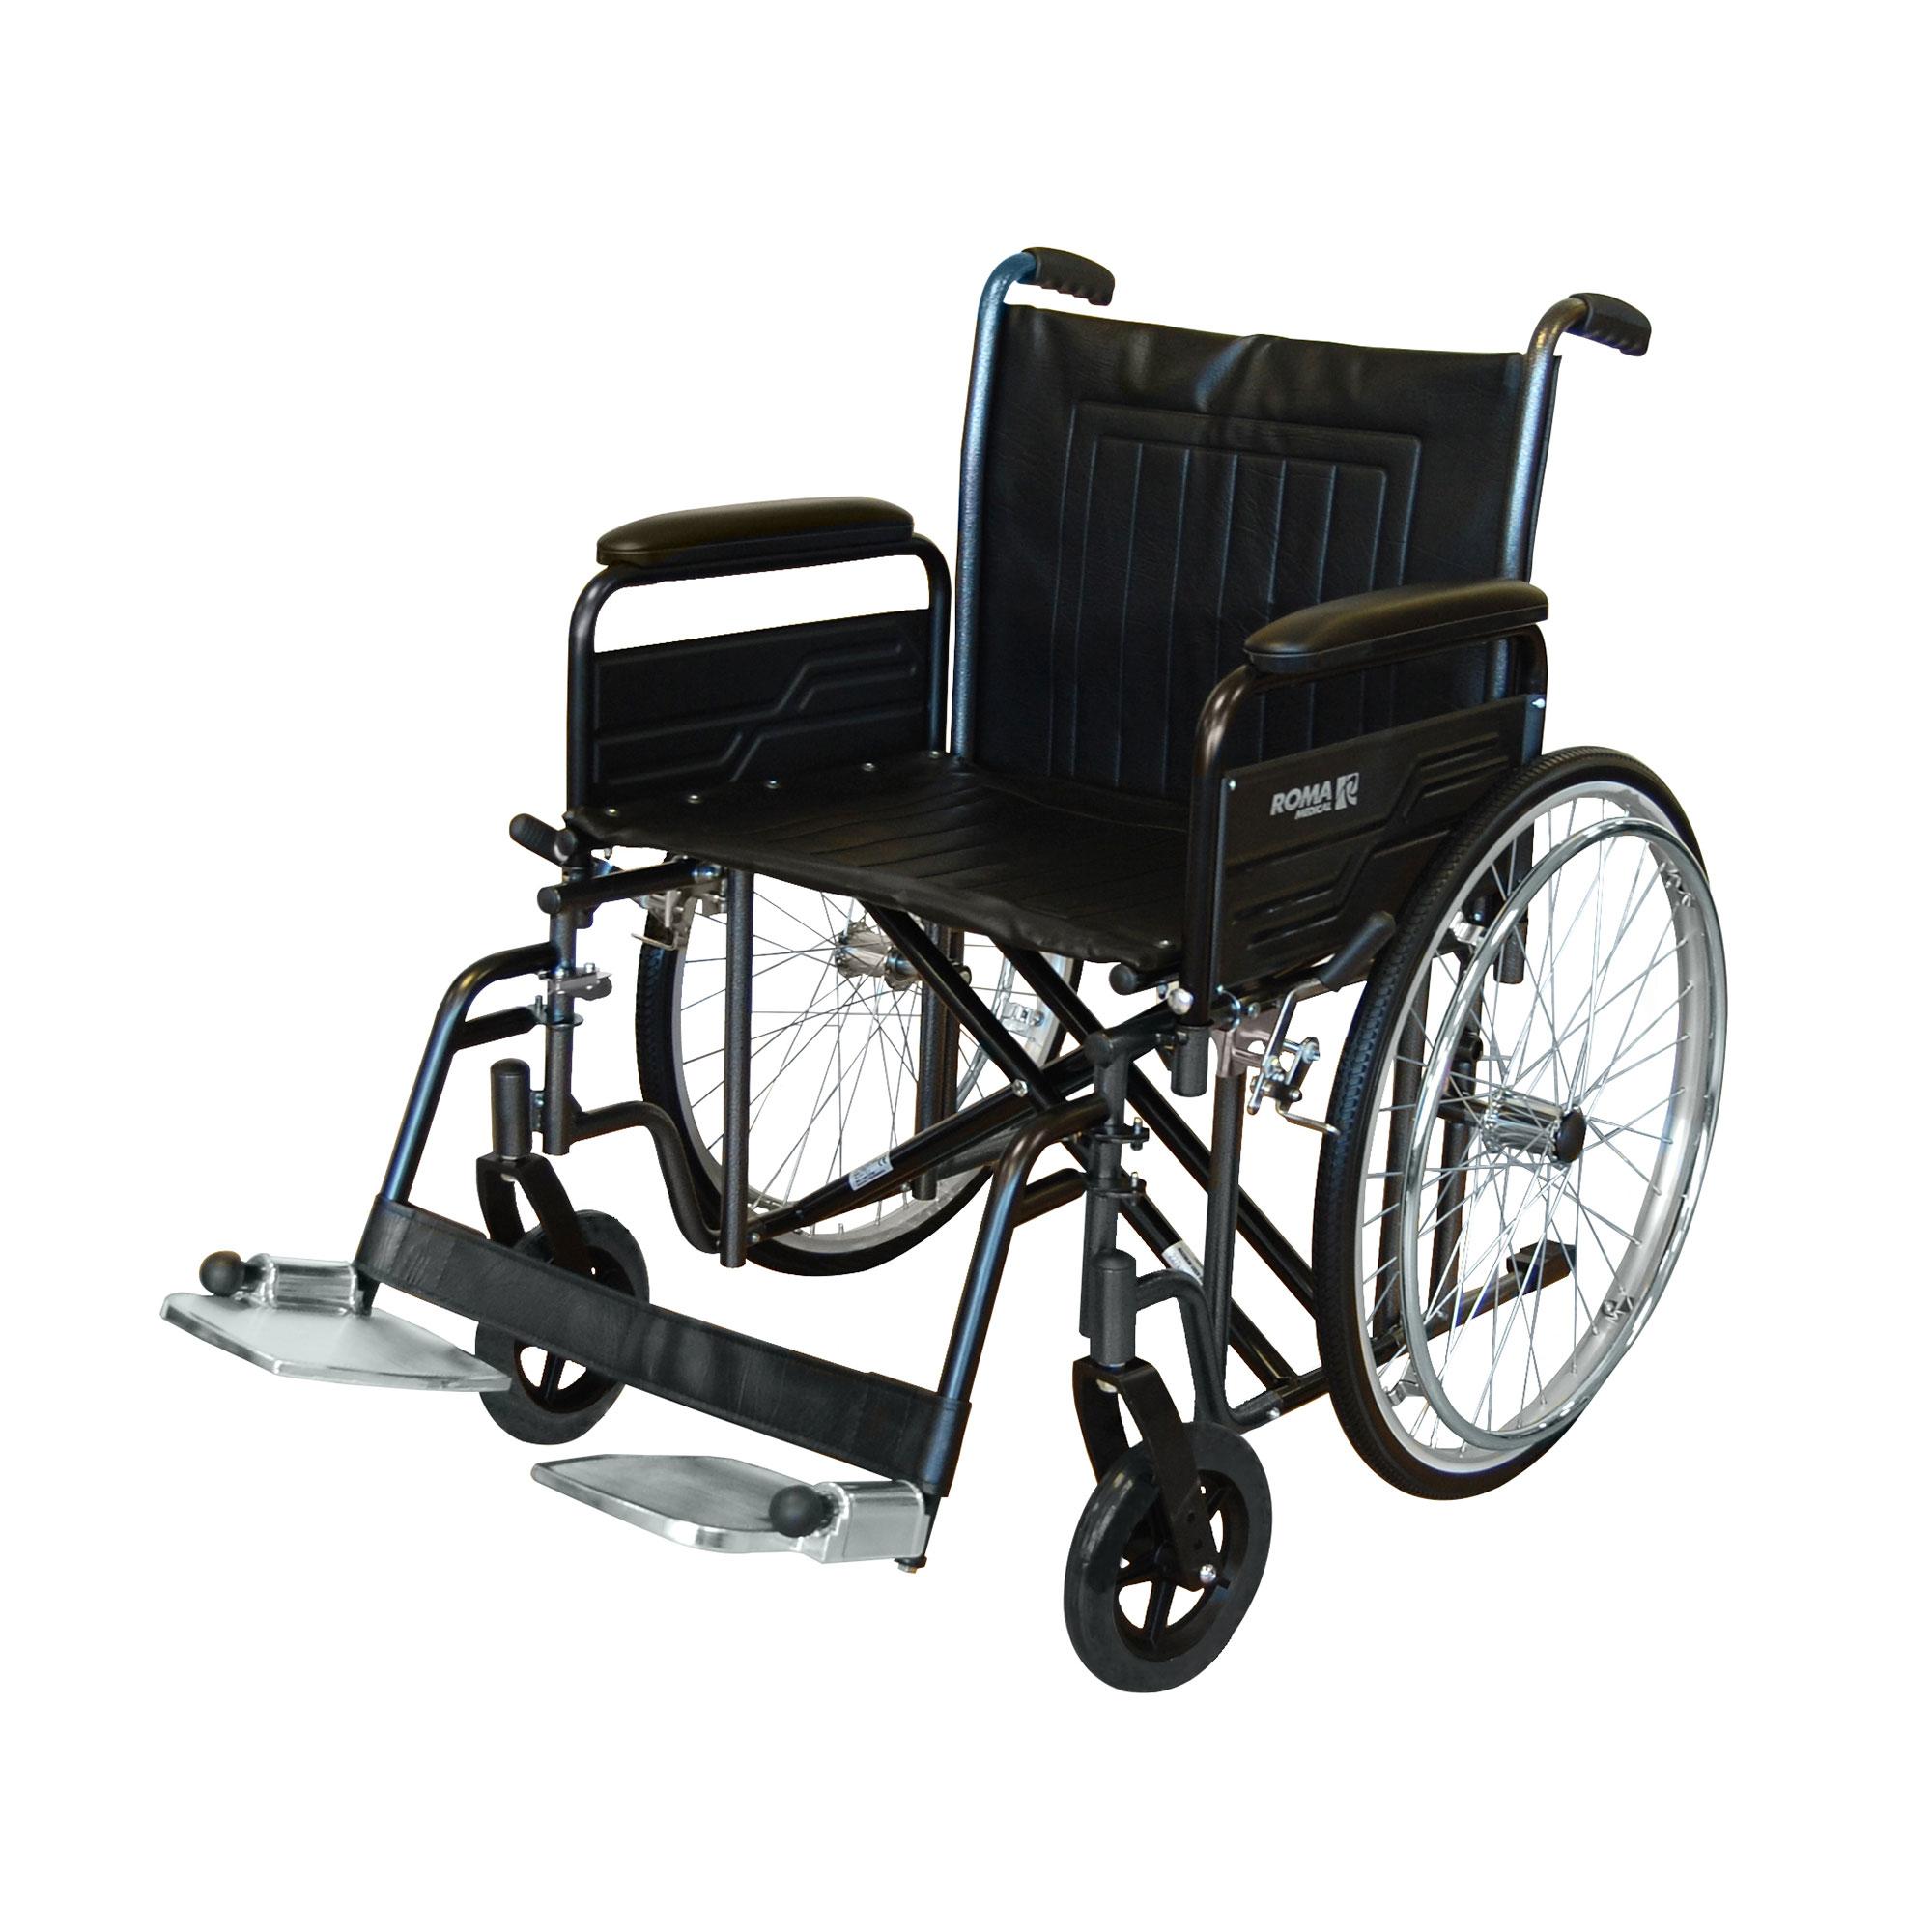 wheelchair nhs stool chair diy 1473 heavy duty self propelled roma medical